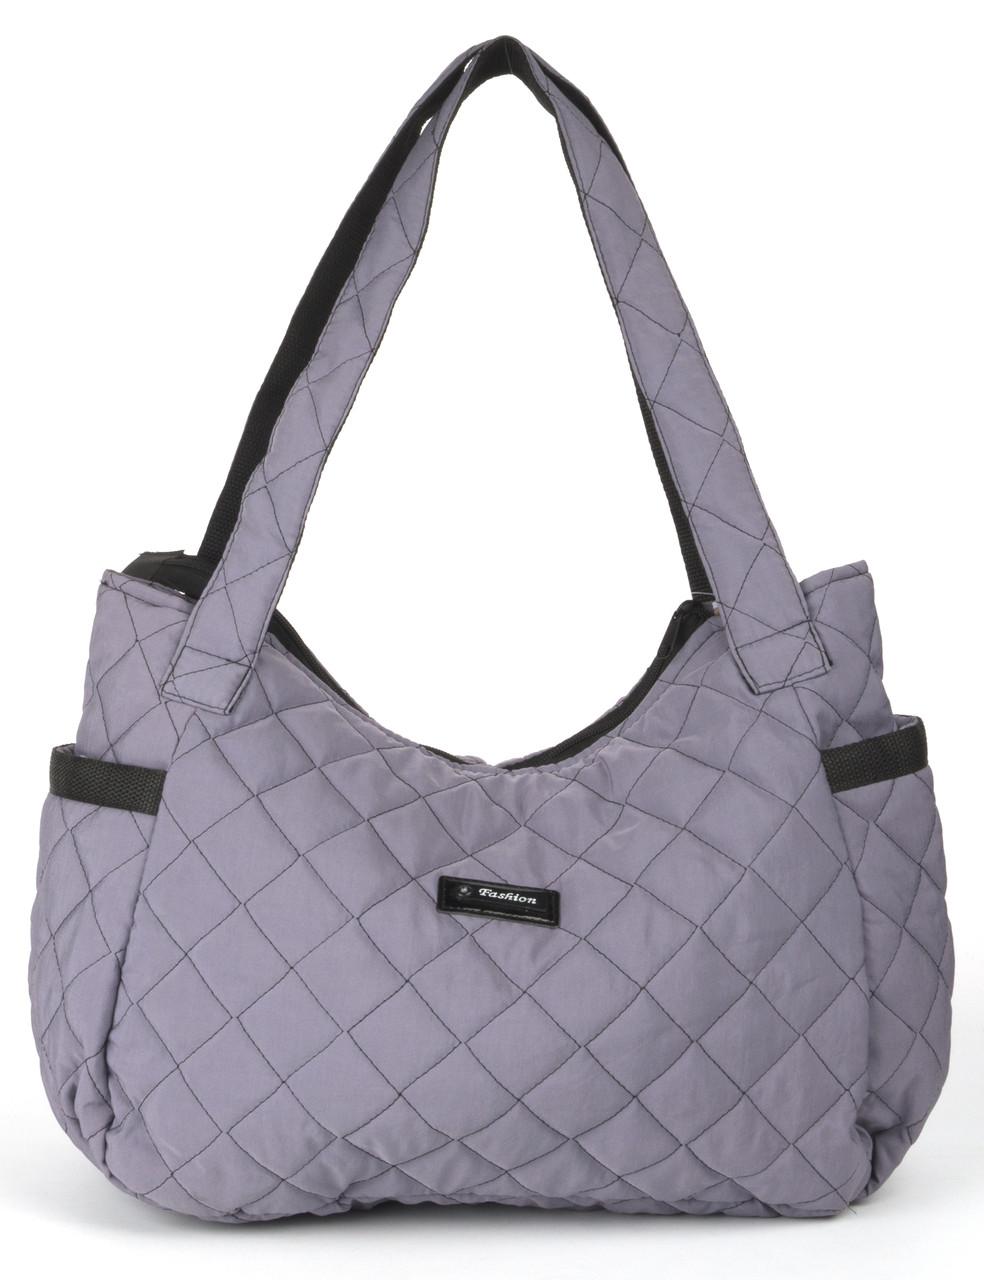 Жіноча спортивна стьобана сумка з накладними кишенями art.245